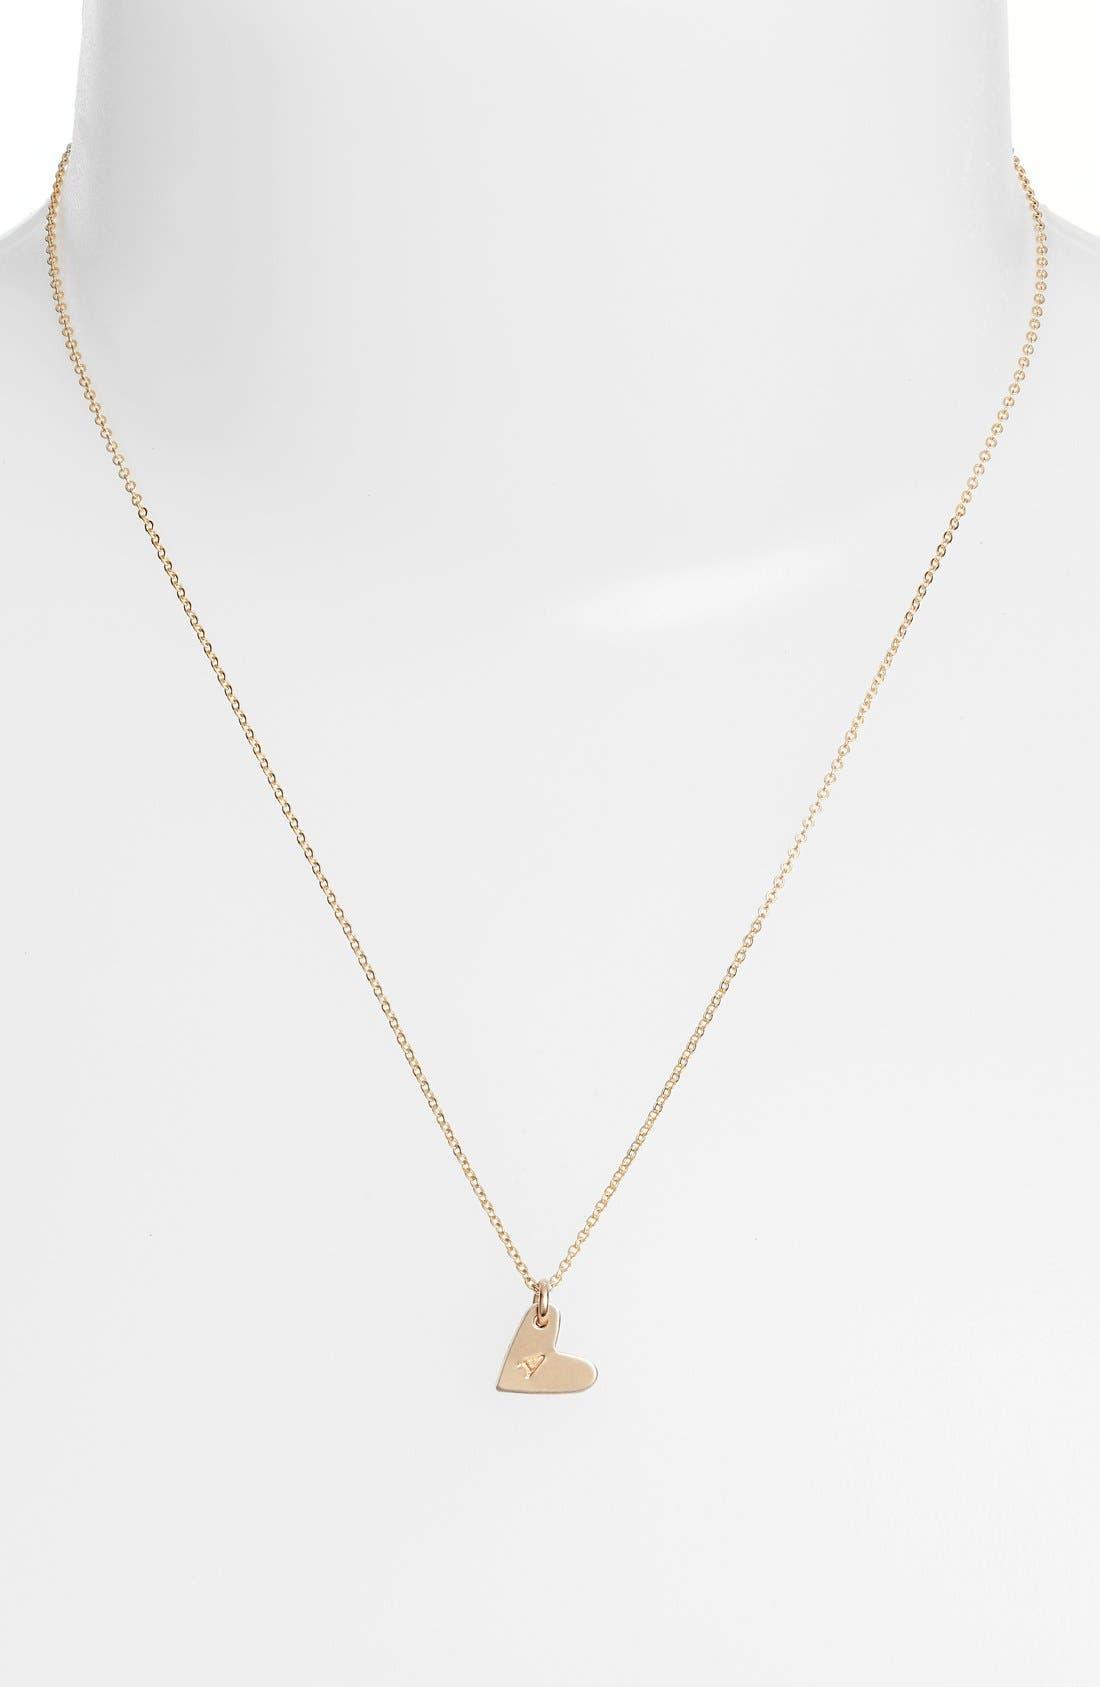 NASHELLE, 14k-Gold Fill Initial Mini Heart Pendant Necklace, Alternate thumbnail 2, color, GOLD/ A